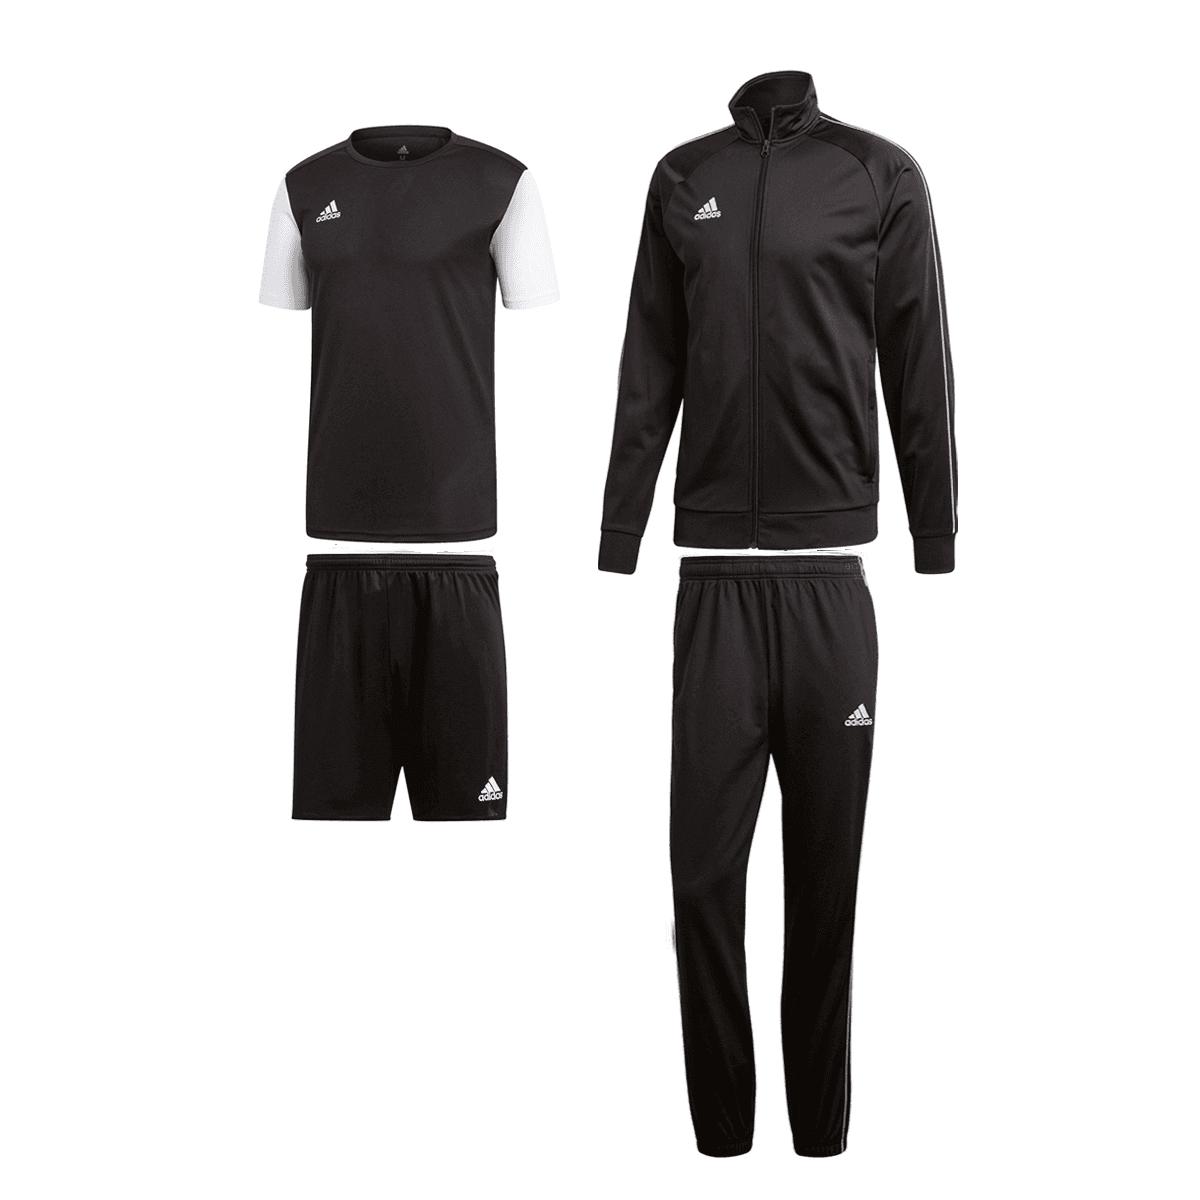 4-teiliges Trainingsset adidas Core 18 (Jacke + T-Shirt + Hose + Shorts) in 5 Farben